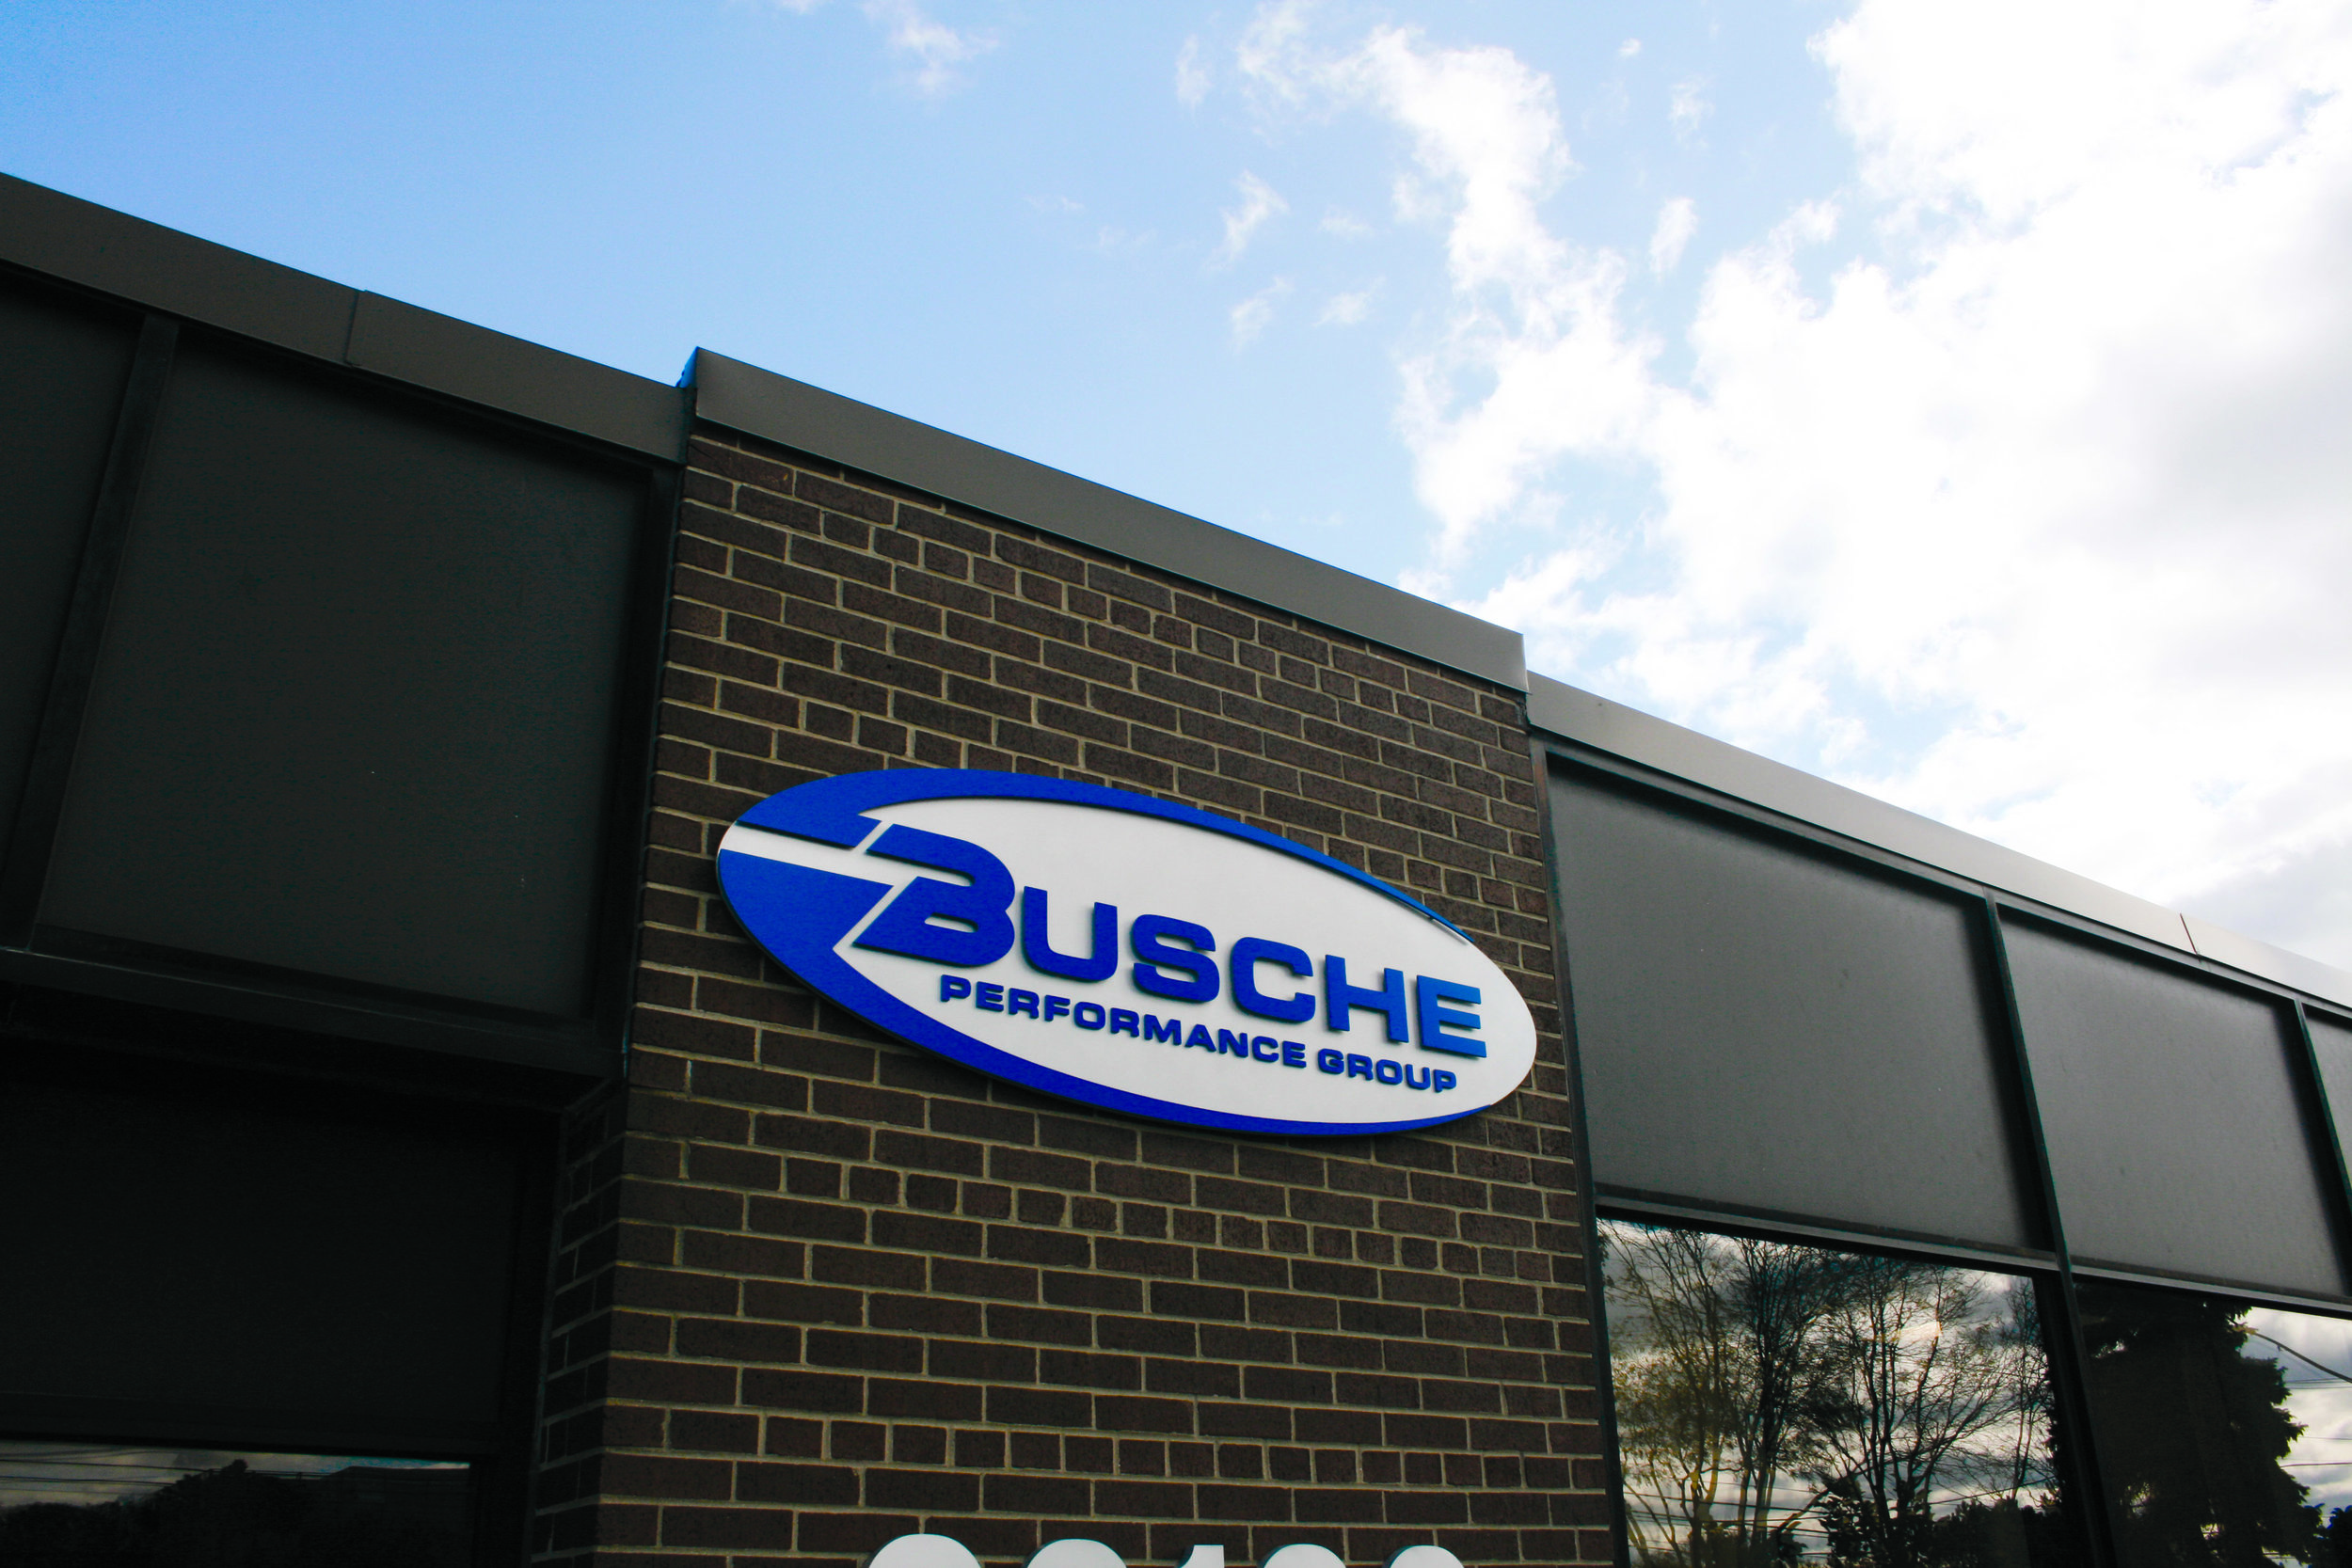 busche_exterior_building_sign.jpg